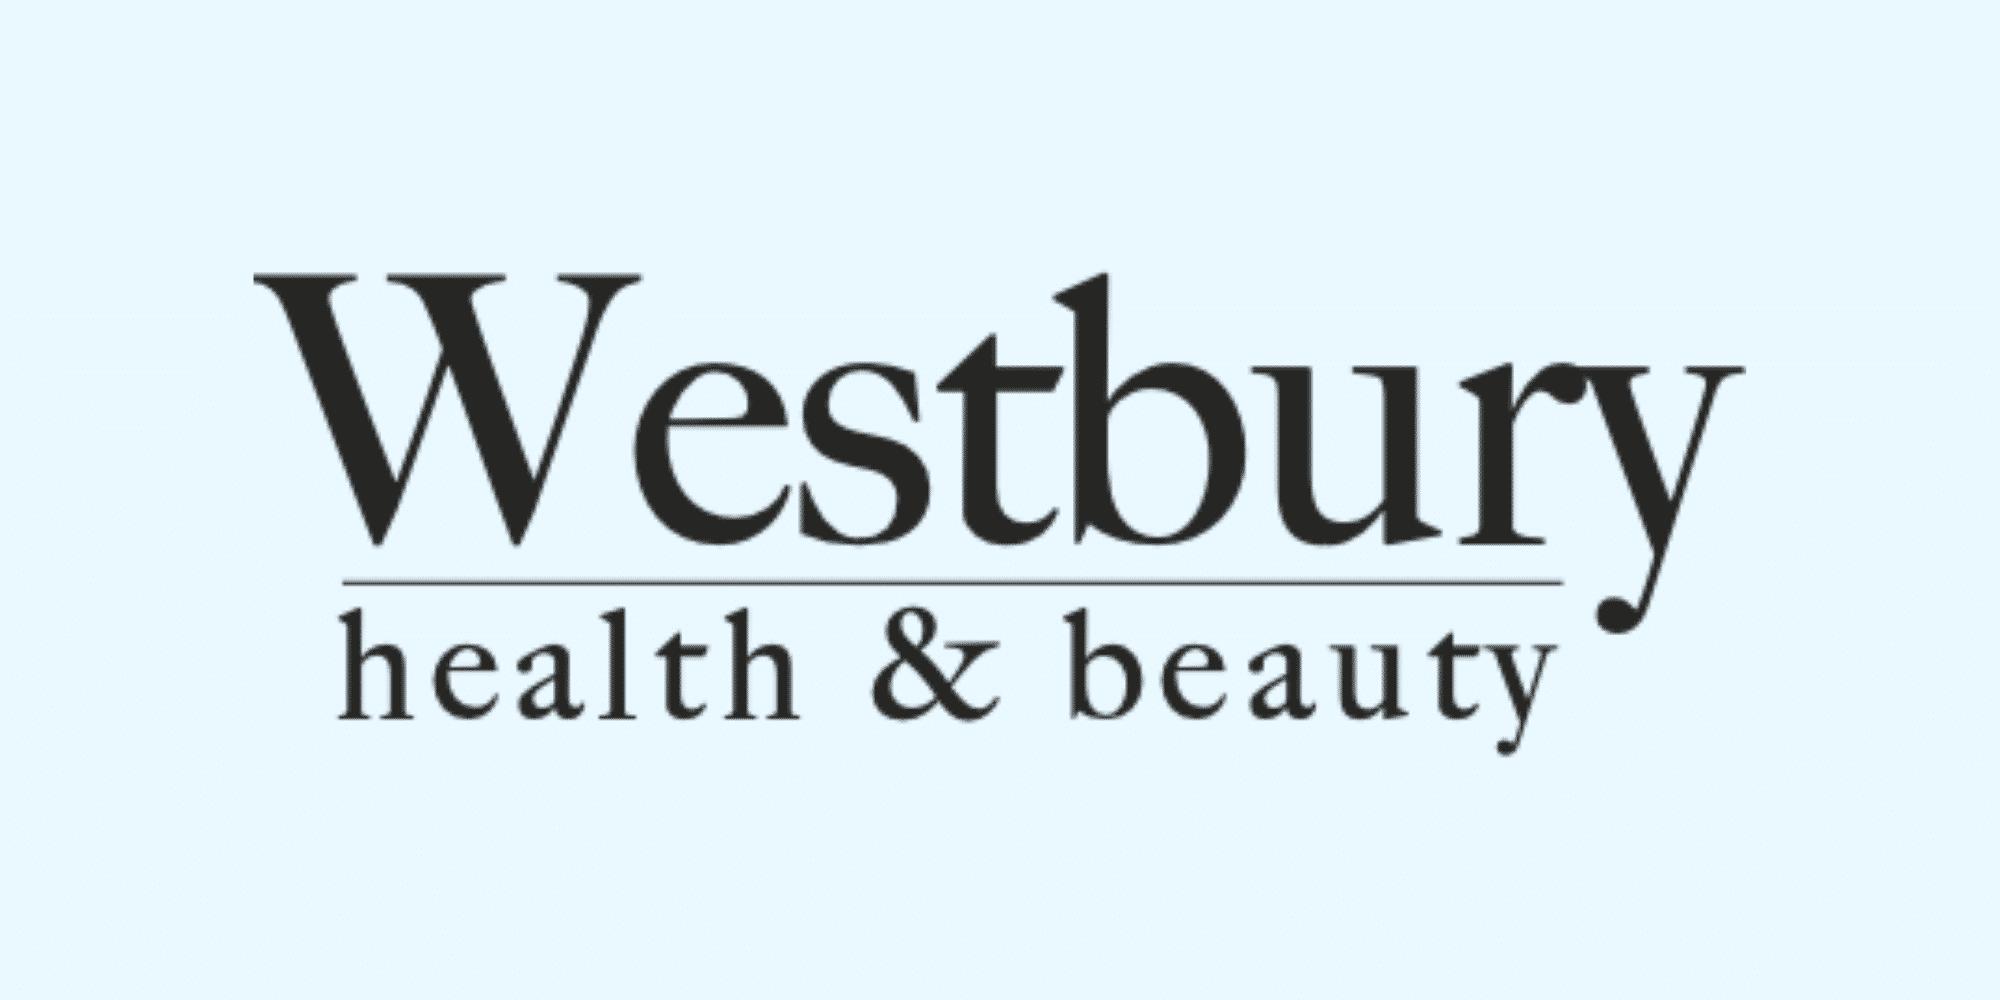 Westbury Health & Beauty